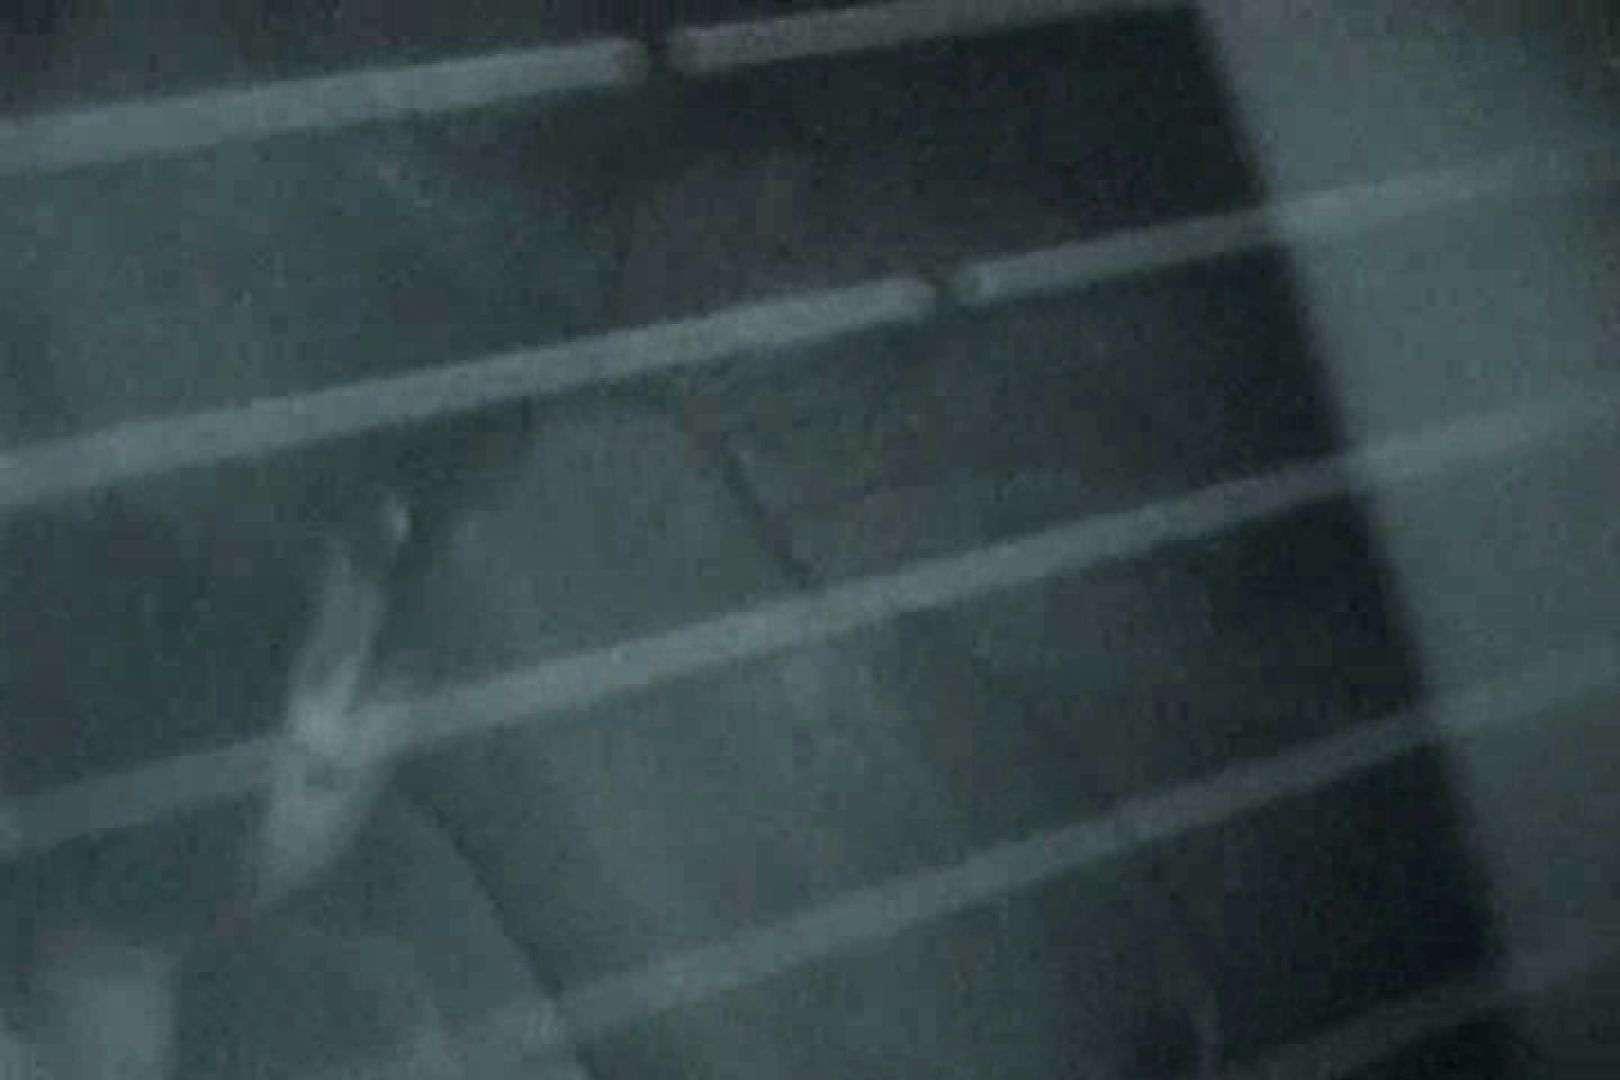 充血監督の深夜の運動会Vol.136 赤外線  106枚 66